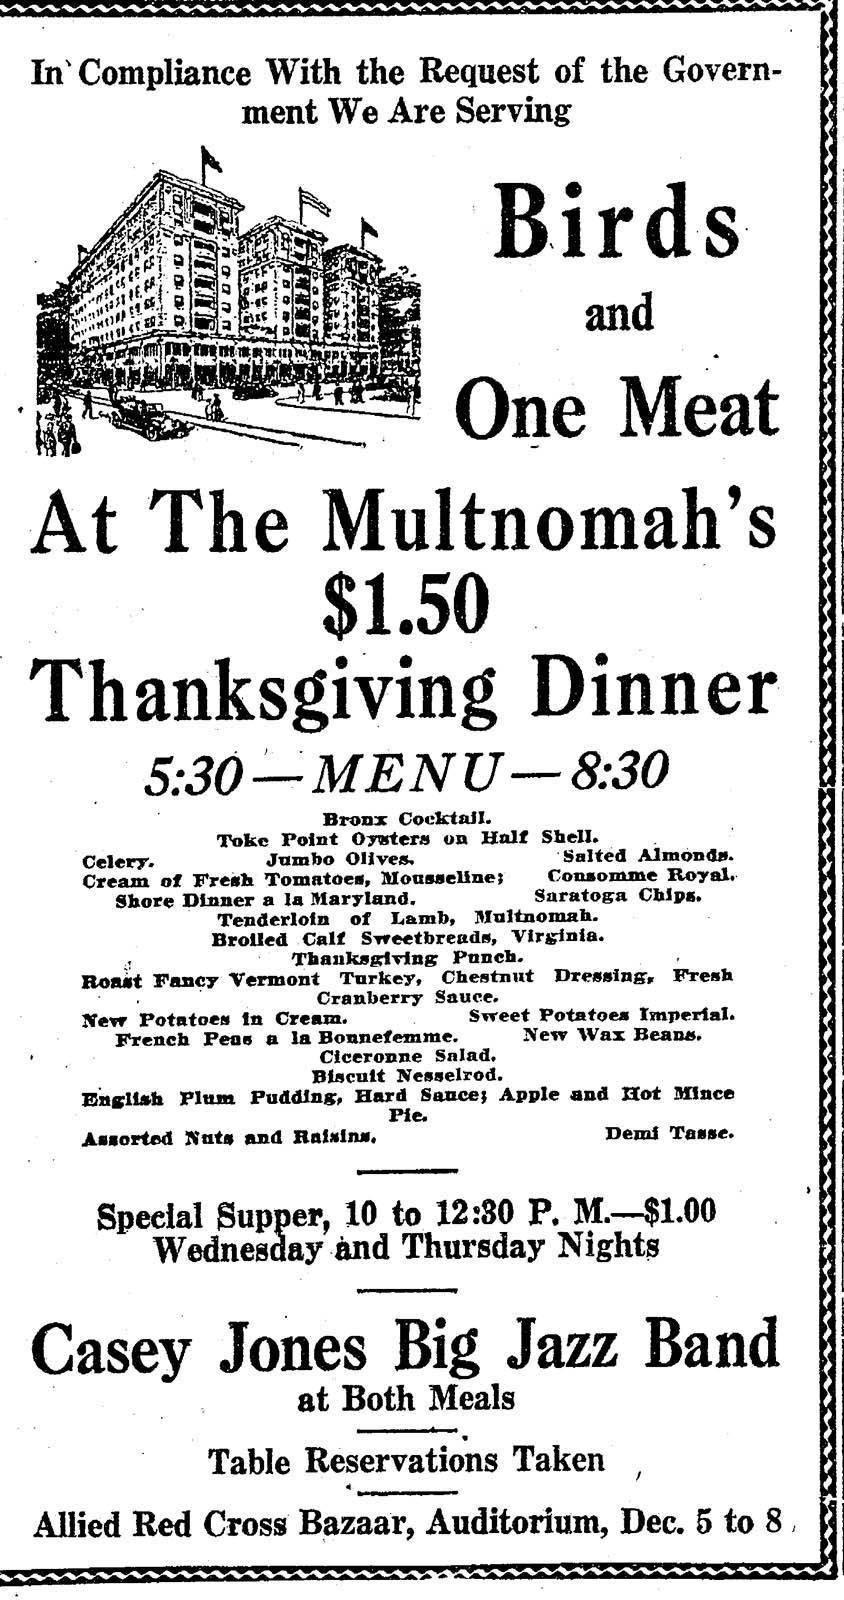 https://vintageportland.wordpress.com/2012/11/22/multnomah-hotel-thanksgiving-1917/